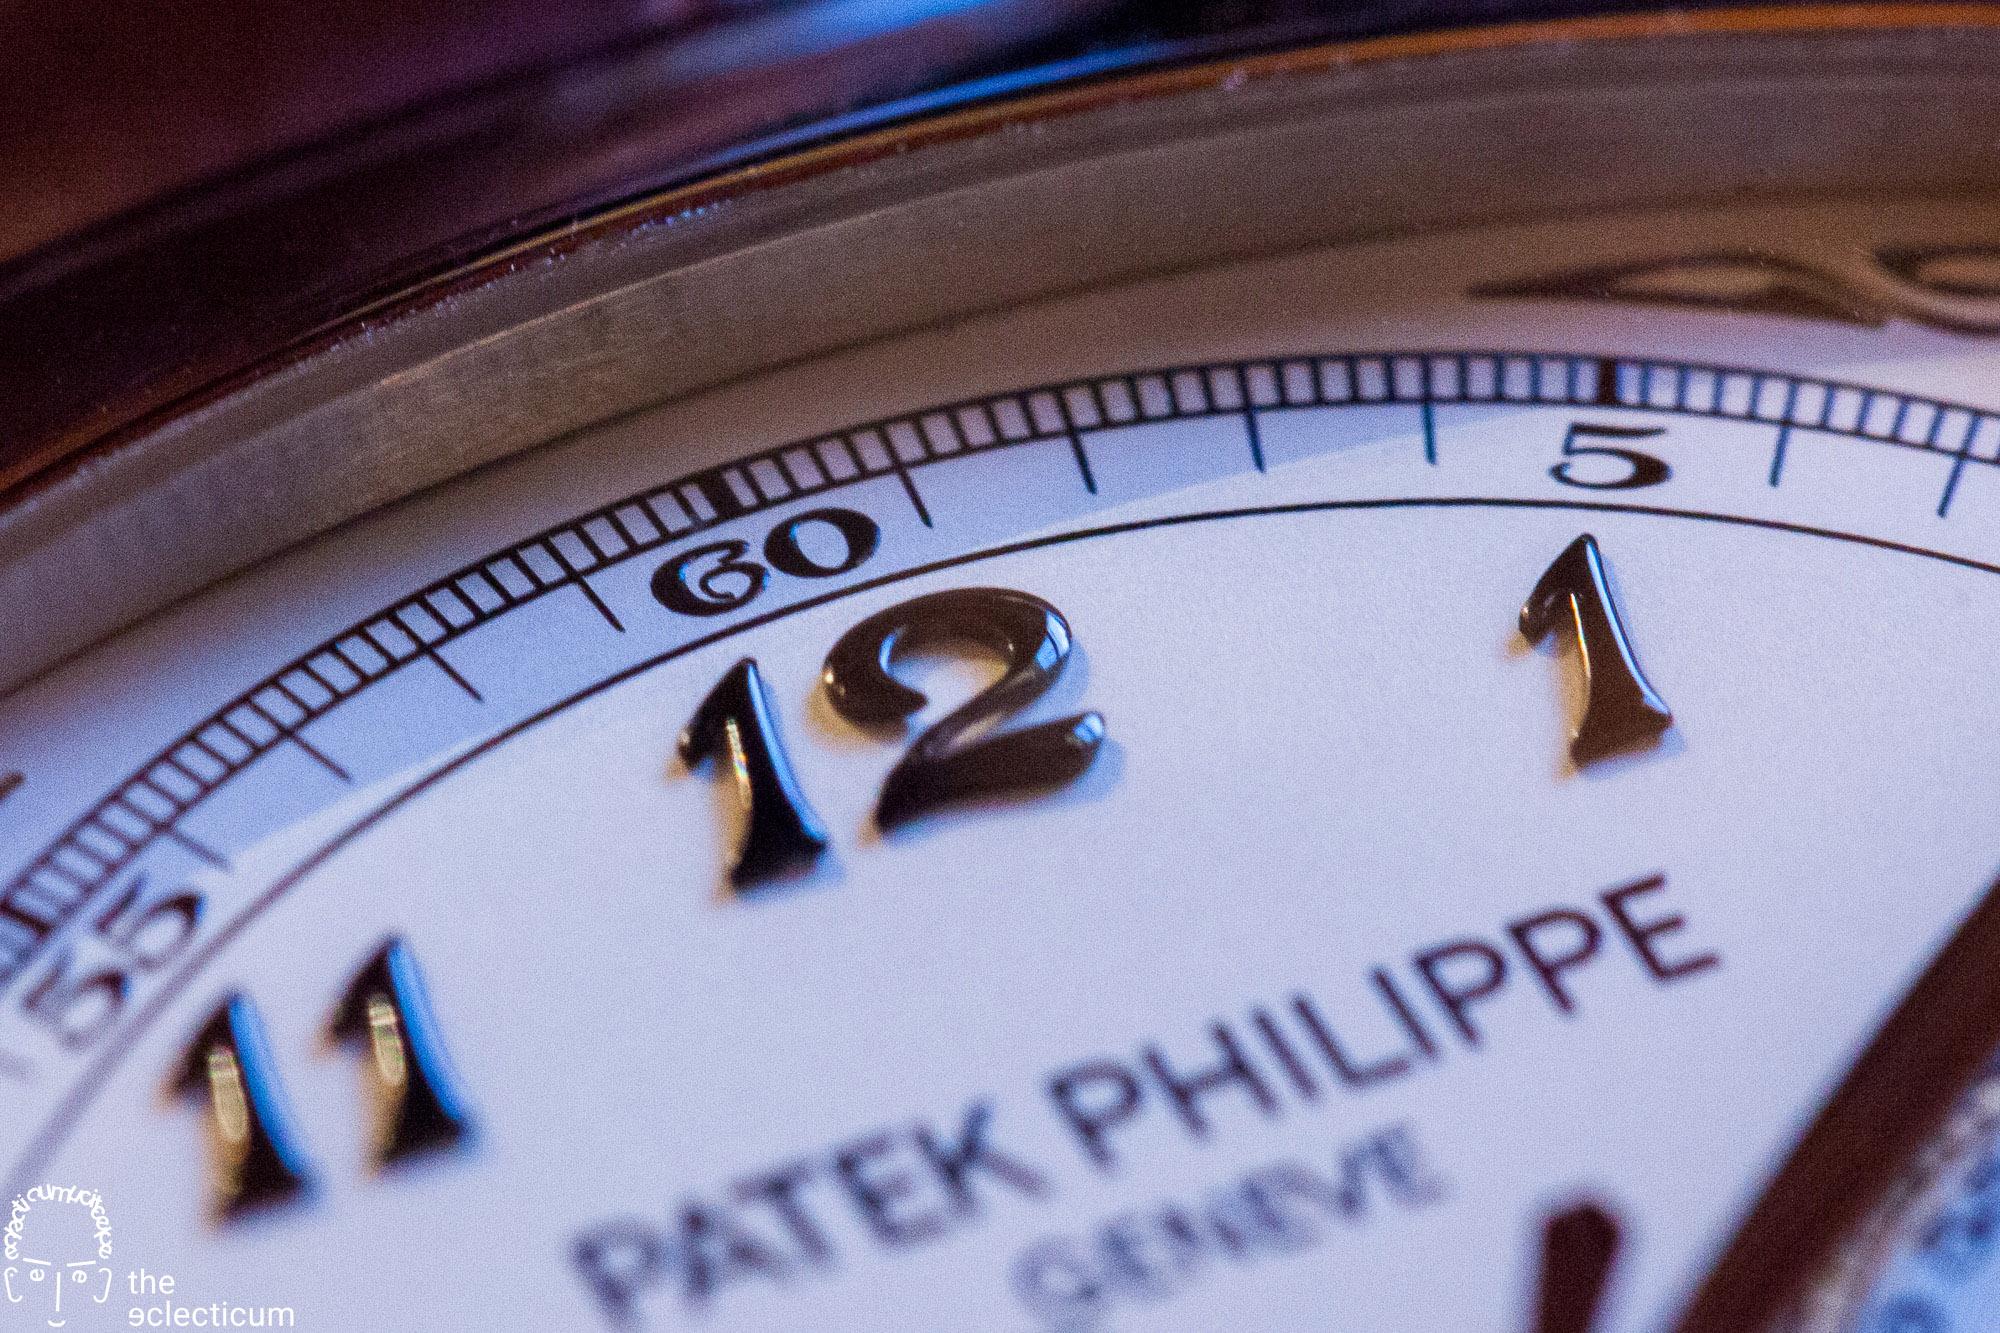 Patek Philippe Split seconds chronograph rattrapante 5950 dial